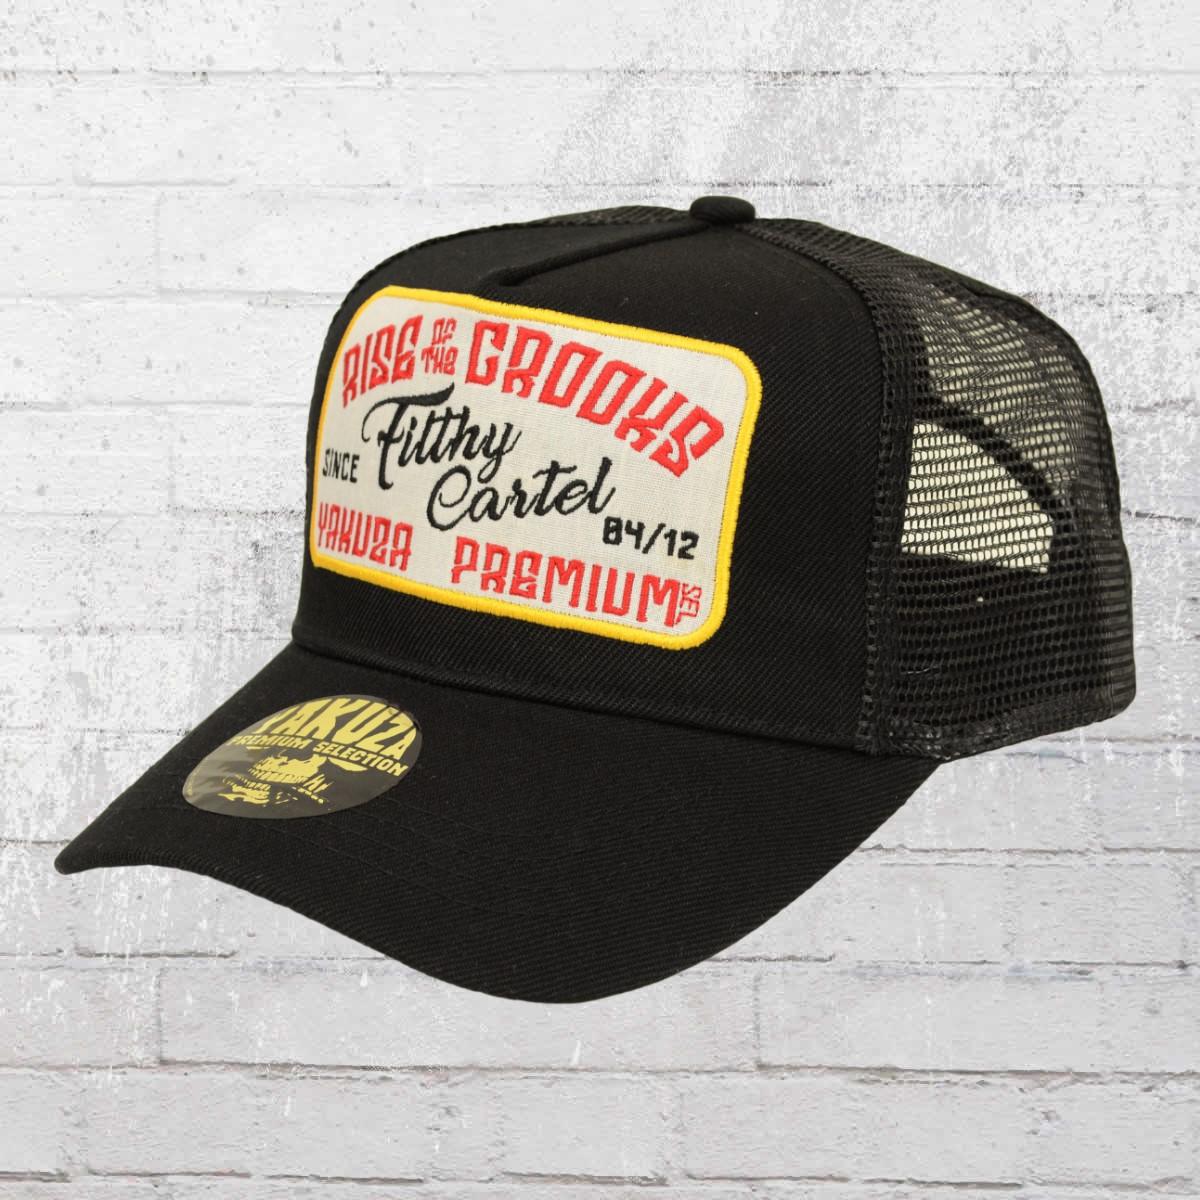 62950b3b794f9f Order now | Yakuza Premium Trucker Hat Fifth Cartel Snapback Cap black